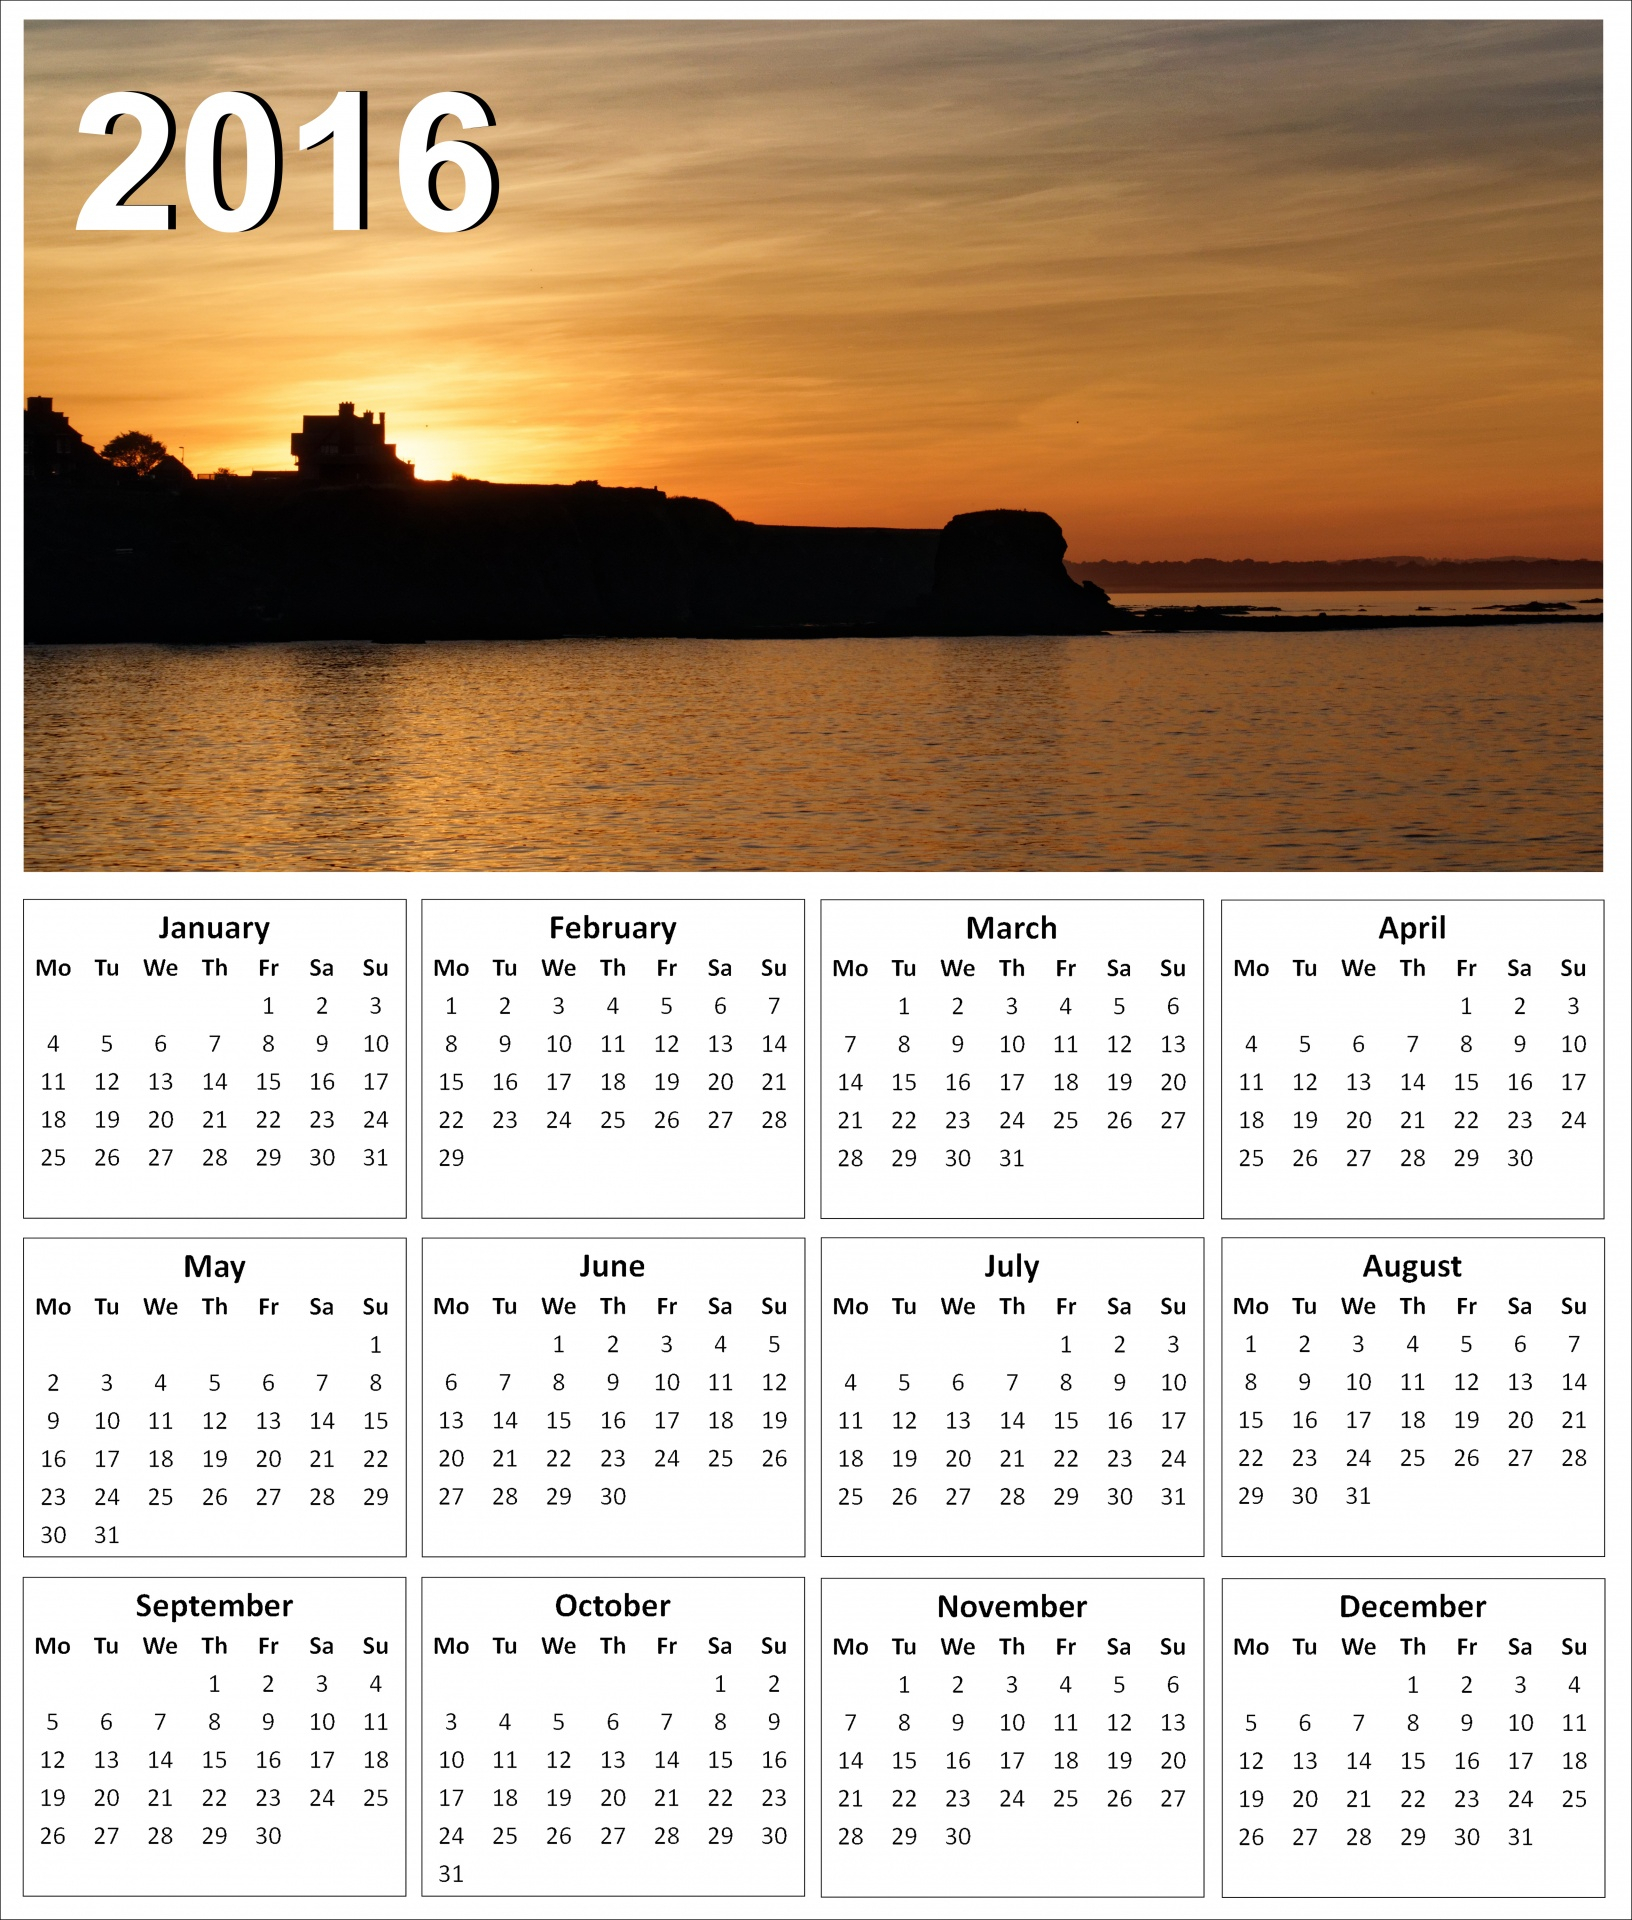 Sunset Calendar - Templates Free Printable within Printable Sunrise Sunset Chart